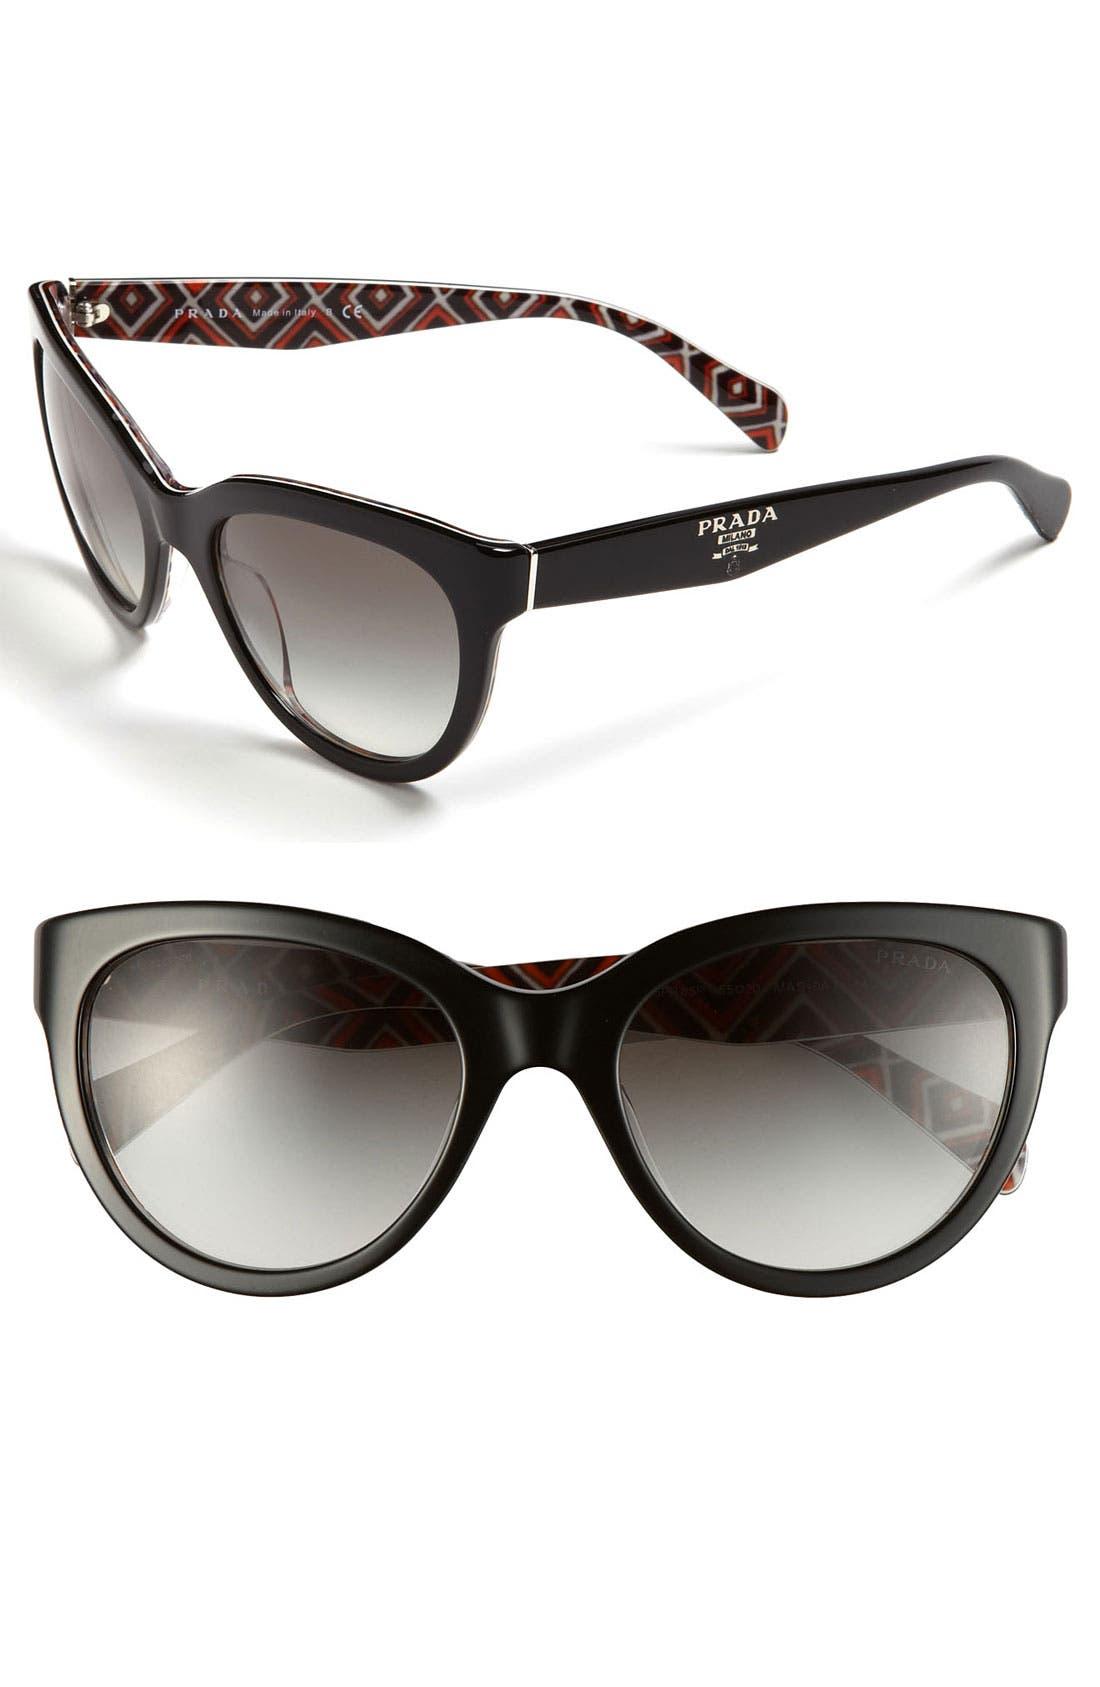 Alternate Image 1 Selected - Prada 'Timeless Phantos' 55mm Sunglasses